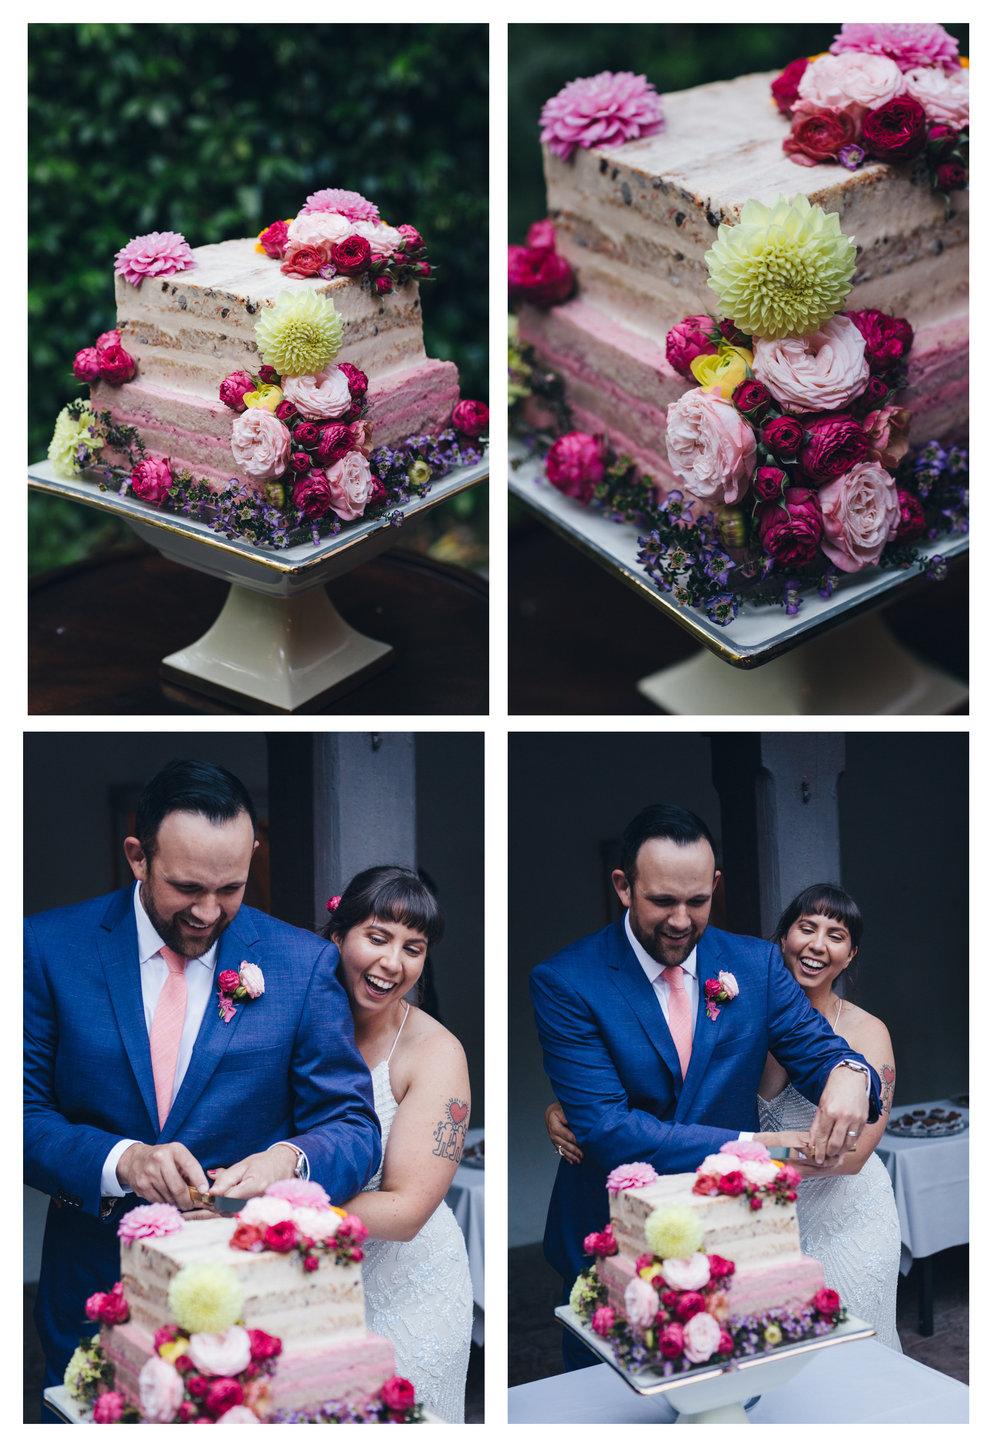 IG_wedding (63 of 110) copy.jpg